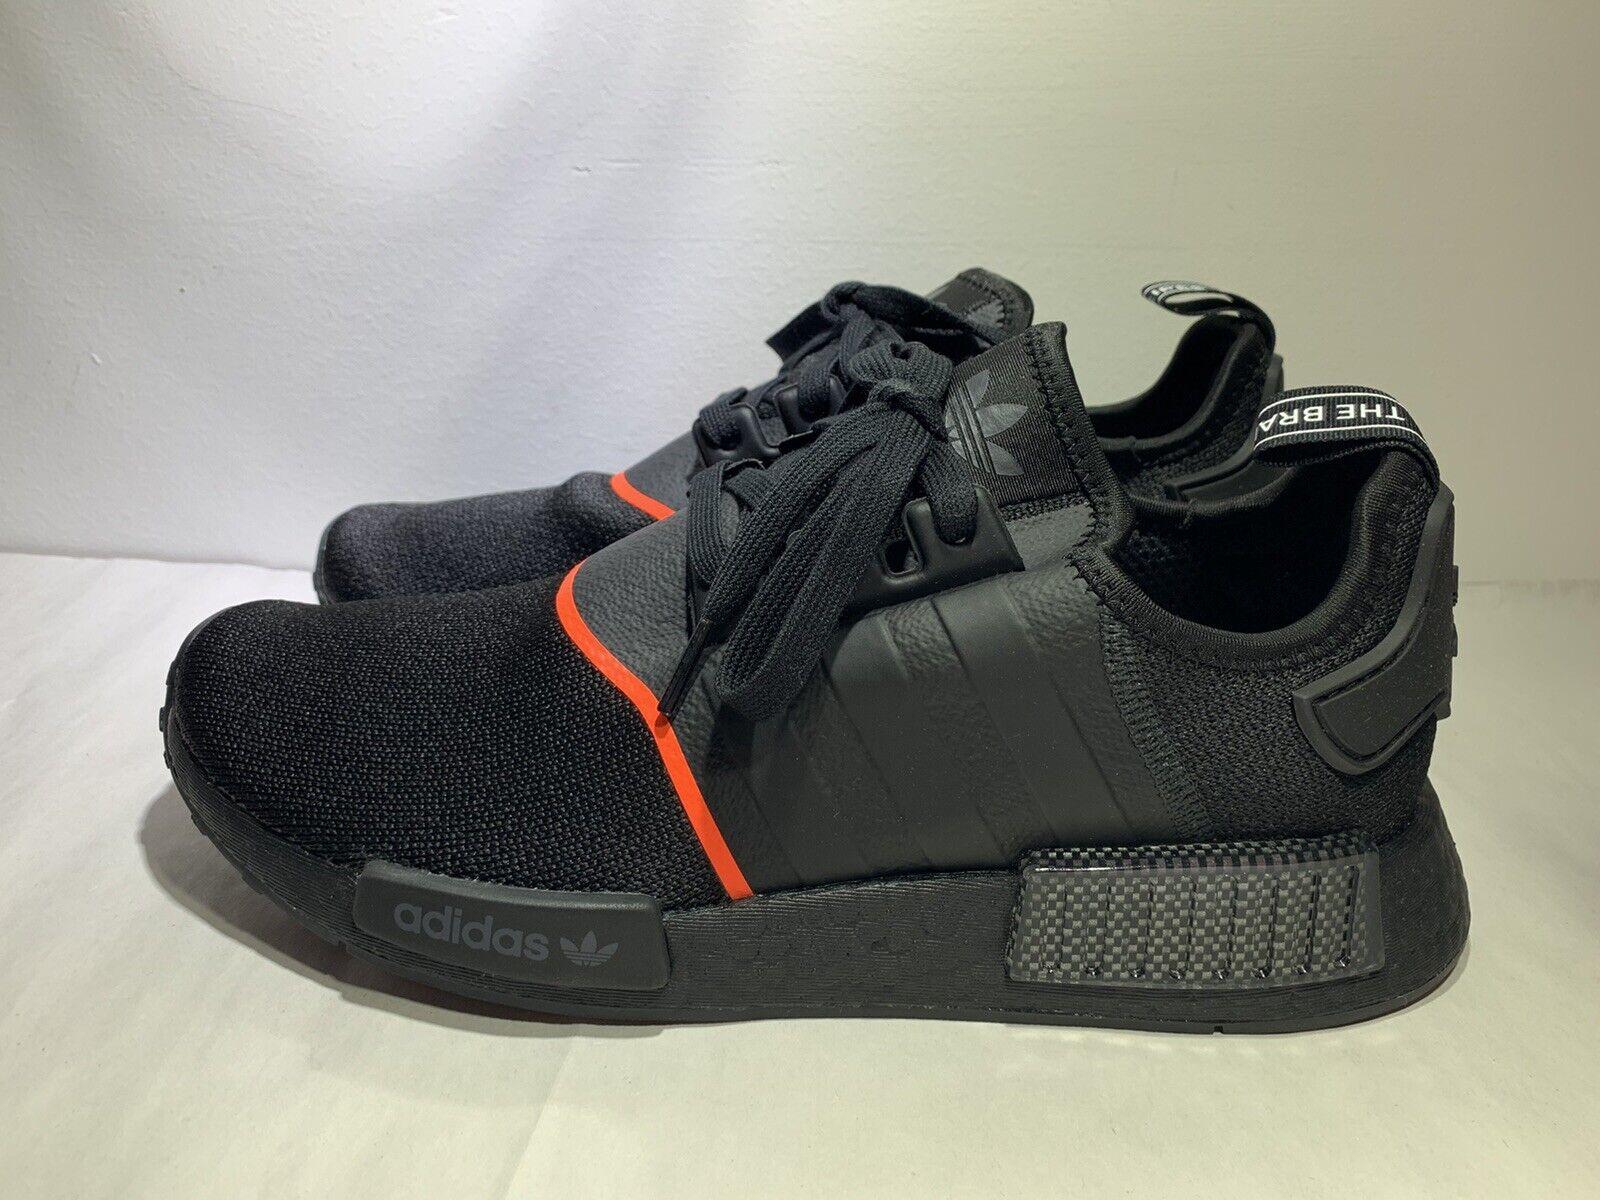 adidas nmd r1 black solar red The